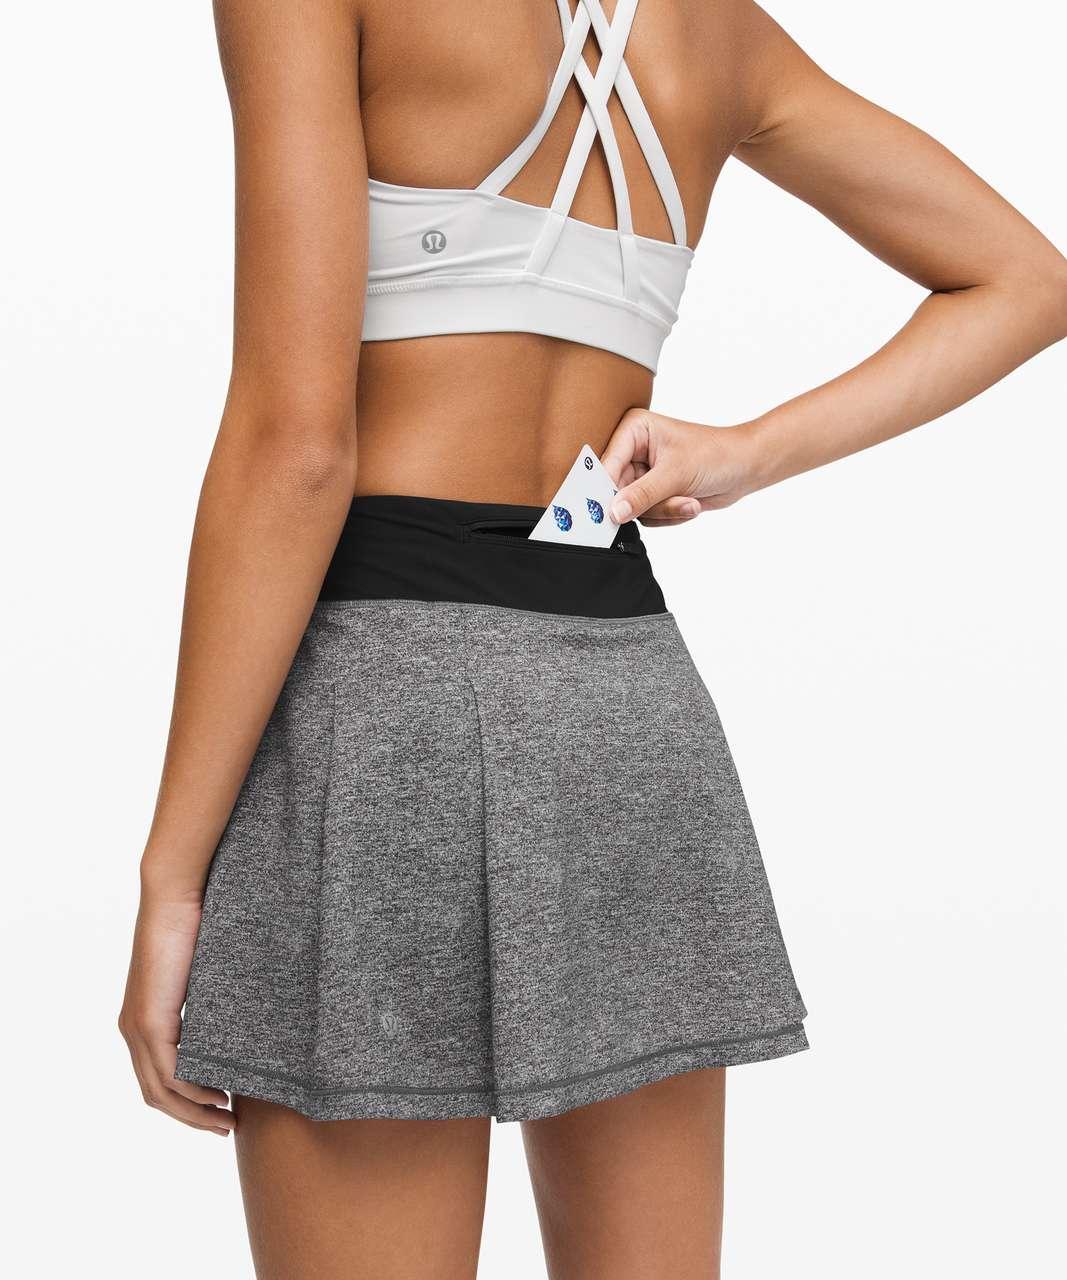 "Lululemon Pace Rival Skirt (Tall) *No Panels 15"" - Heather Lux Multi Black / Black"